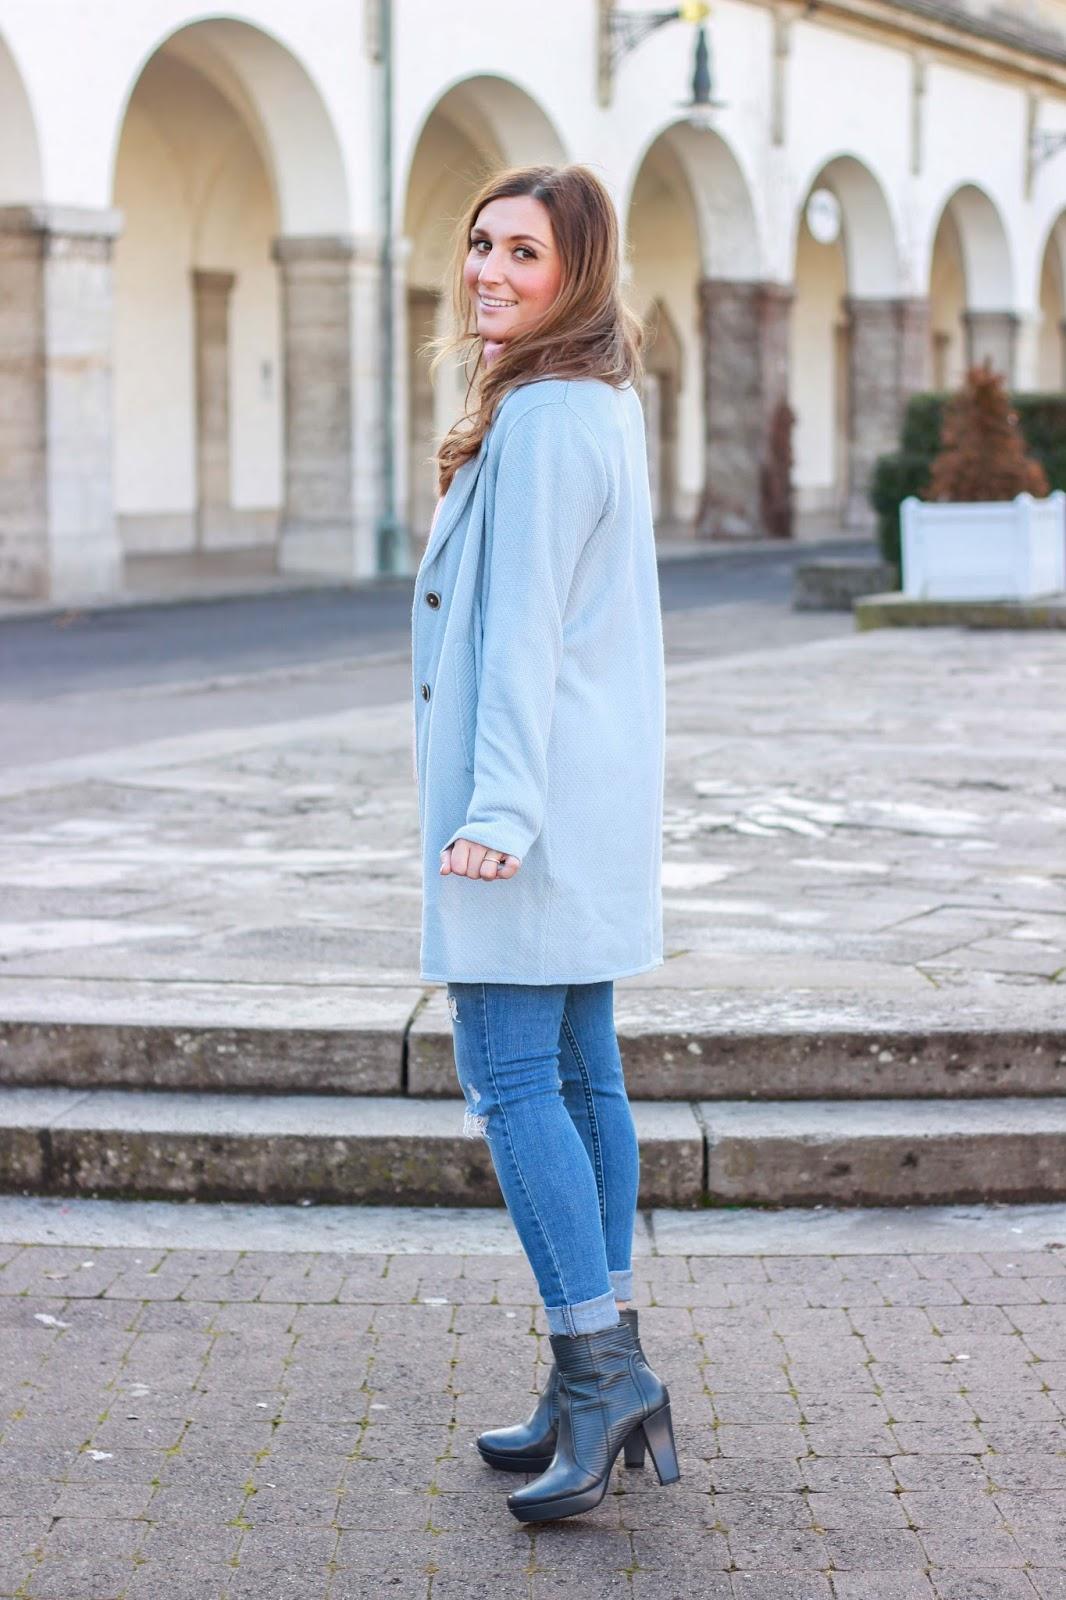 Fashionblogger aus Deutschland - German Fashionblogger - Streetetyle - Fashionstylebyjohanna - Rosa Rolli- Blauer Mantel